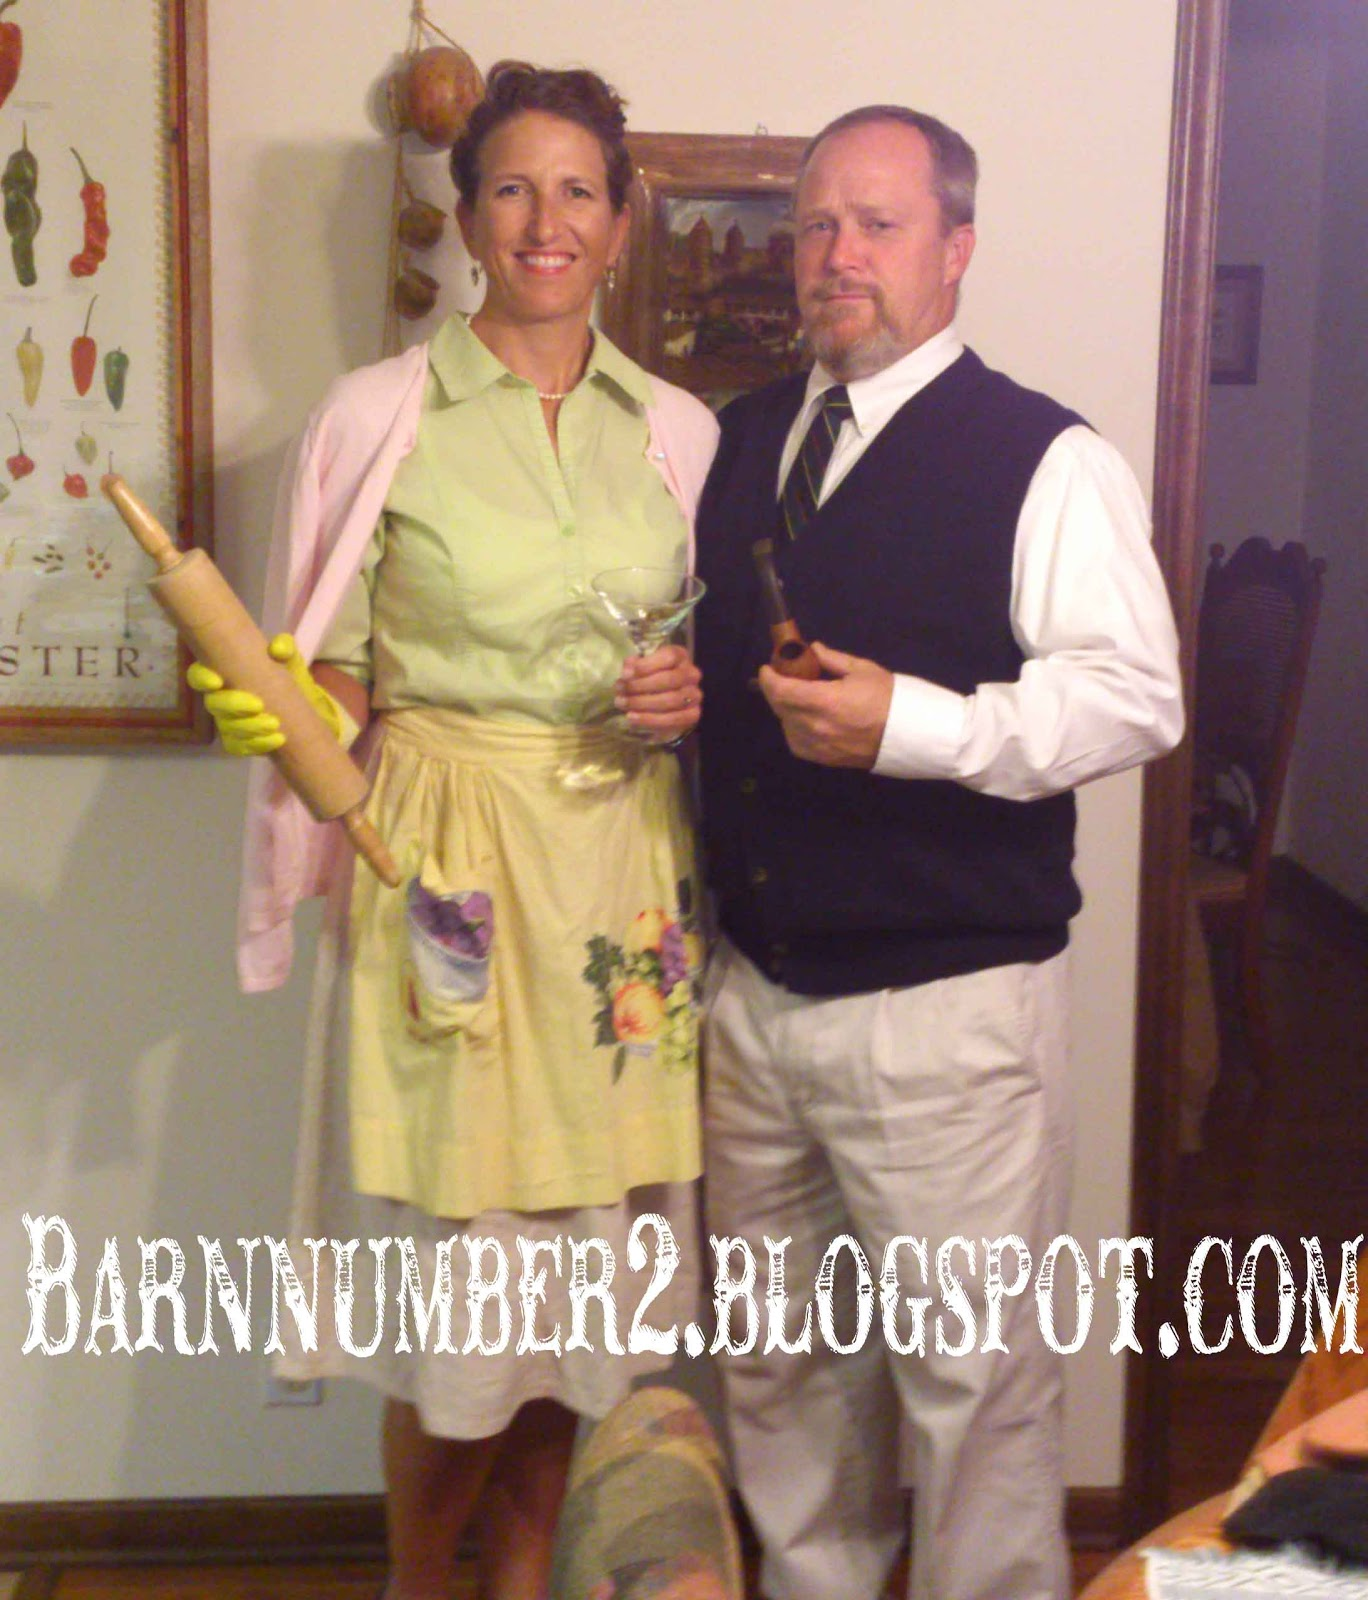 creative couples halloween costumes 2012 42980 | movieweb